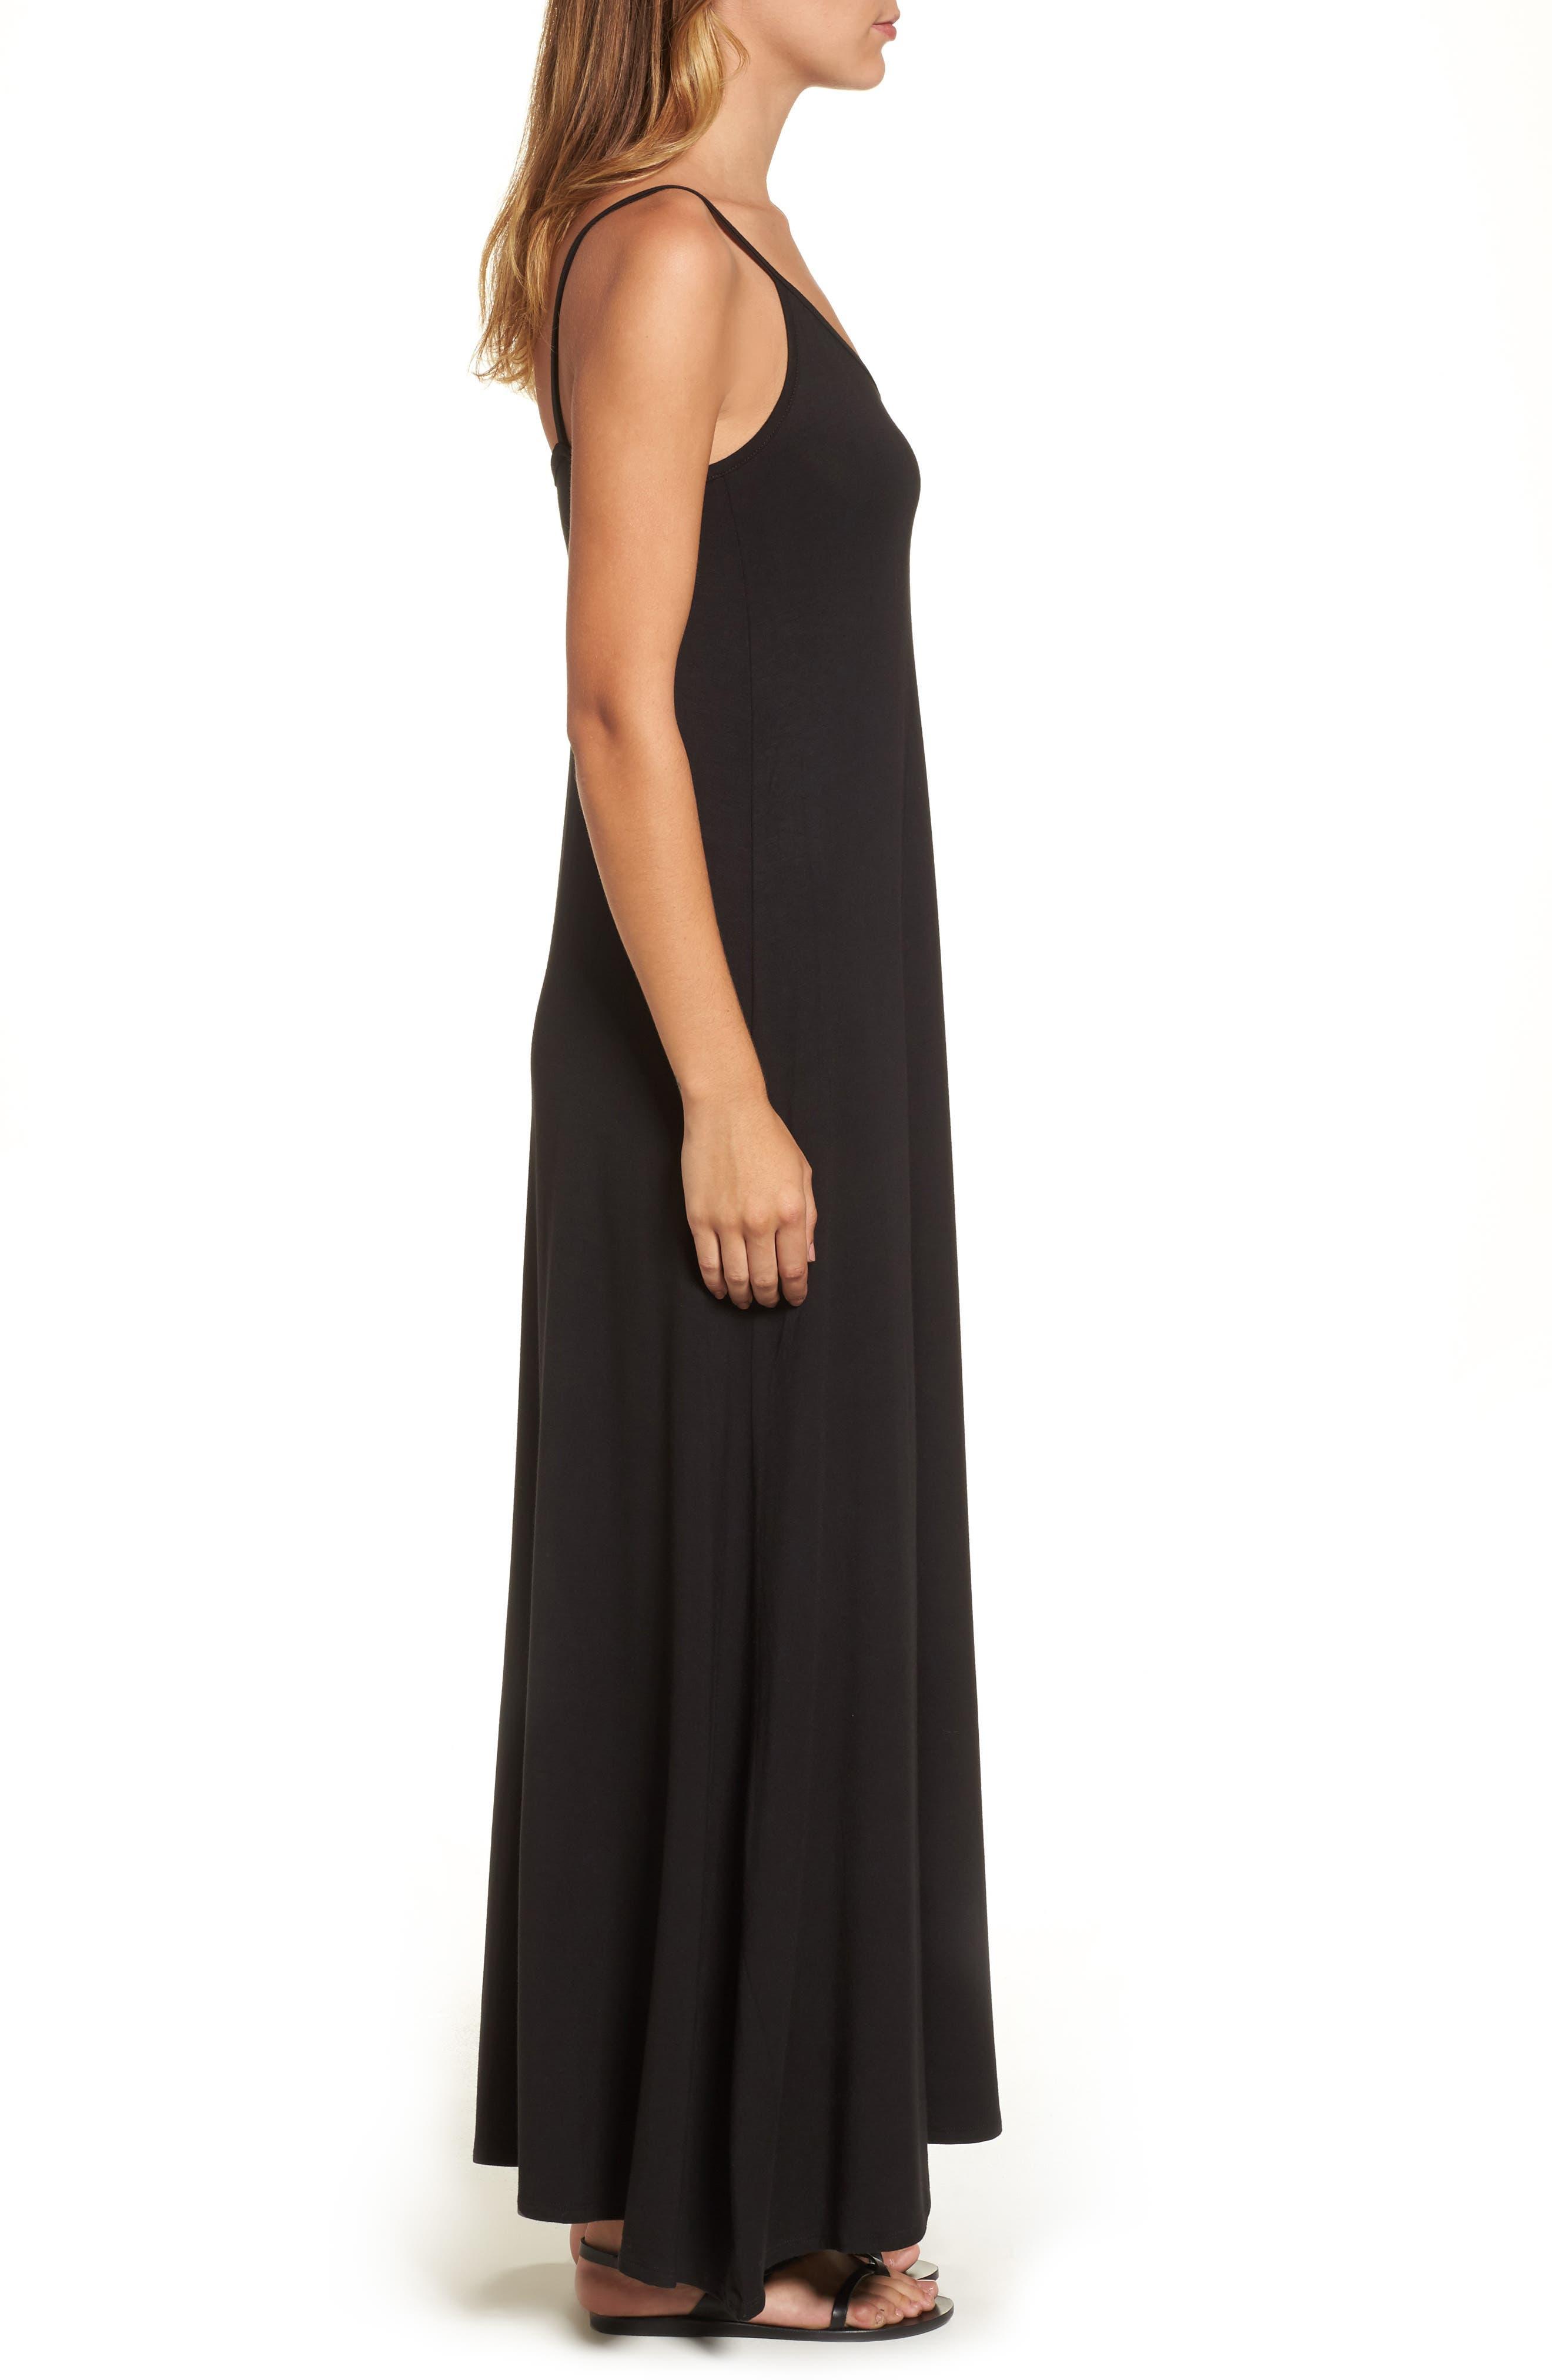 LOVEAPPELLA, Knit Maxi Dress, Alternate thumbnail 5, color, BLACK